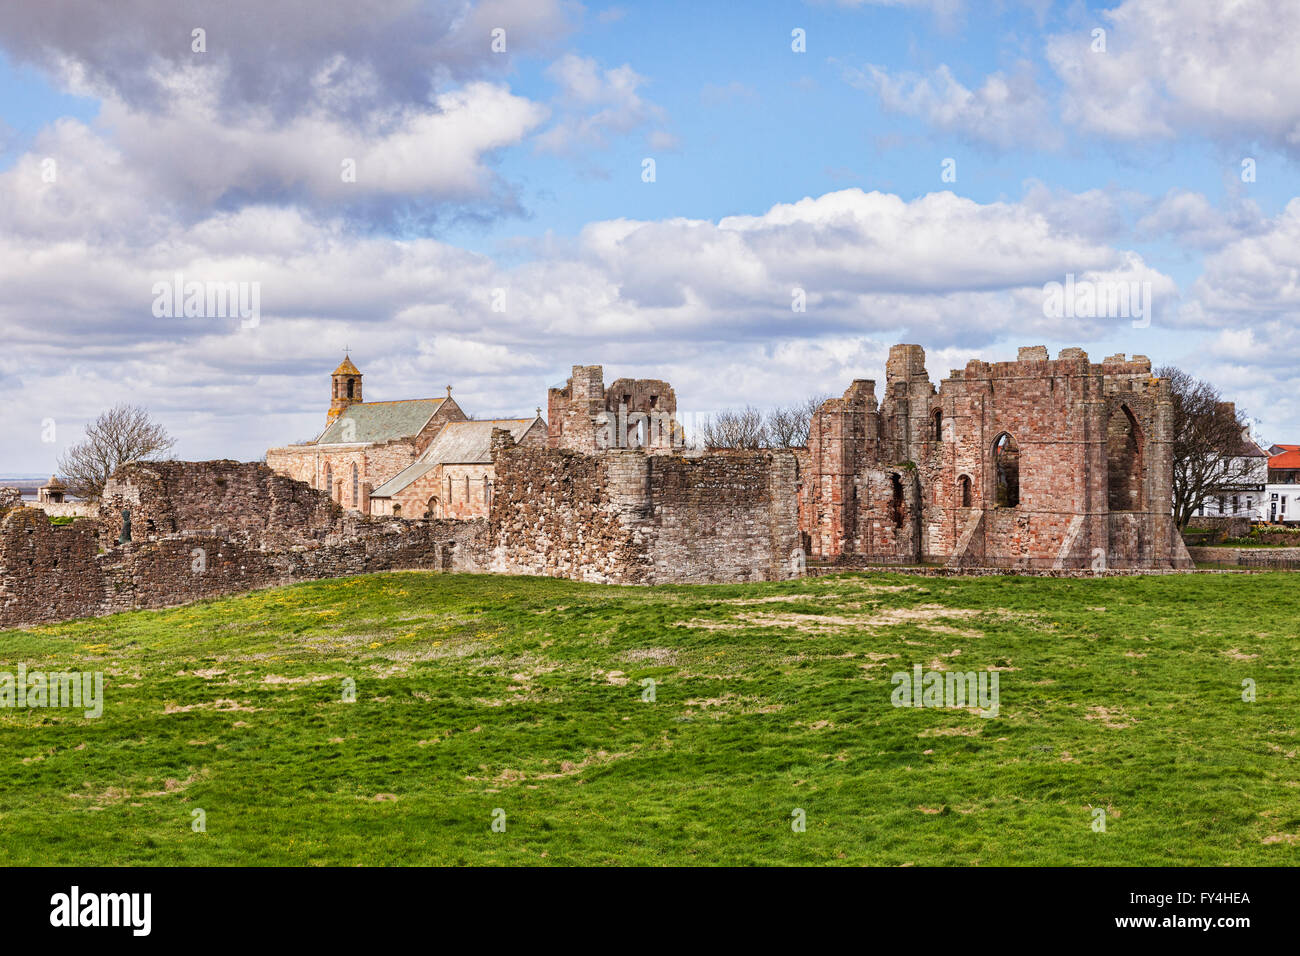 Lindisfarne Priory and St Mary's Church, Holy Island, Northumberland, England, UK - Stock Image